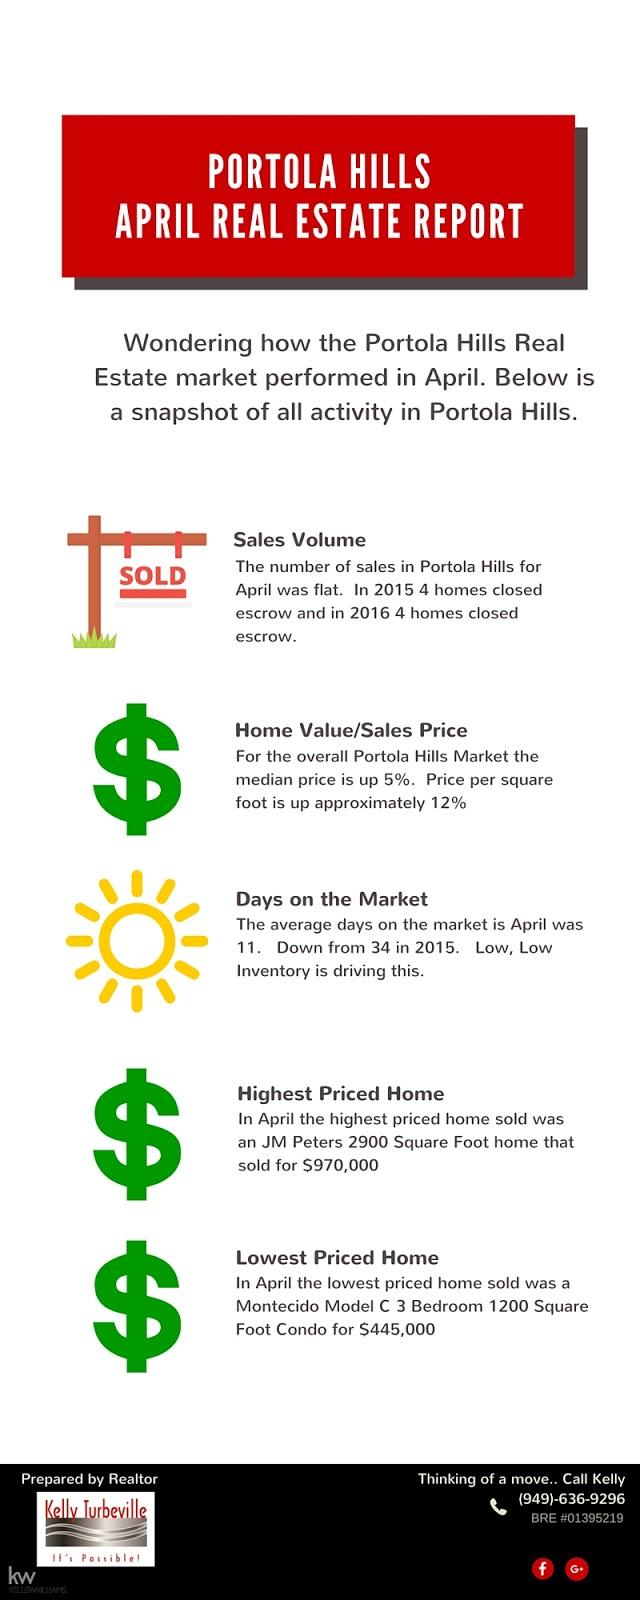 Real Estate Sales in Portola Hills for April